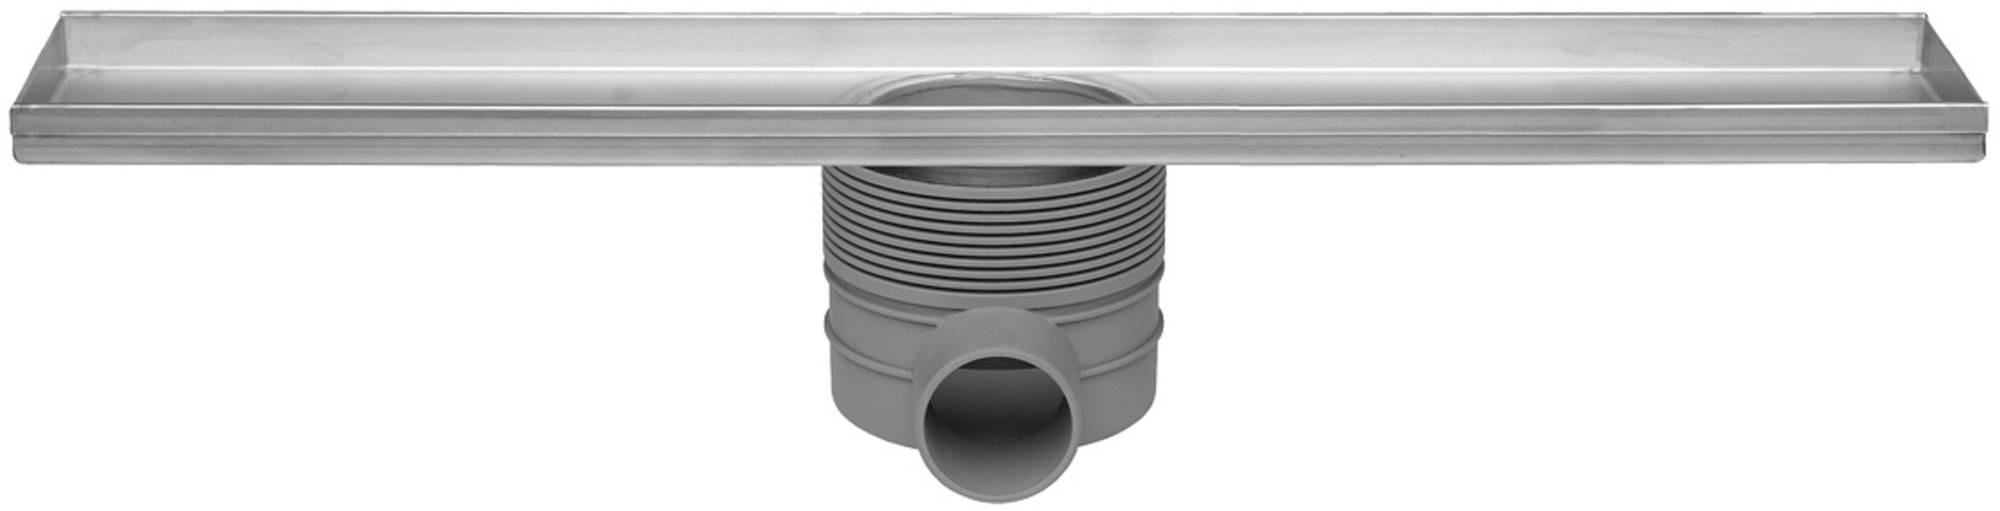 Easydrain Multi inbouwdeel drain 90 cm, zonder rooster, rvs